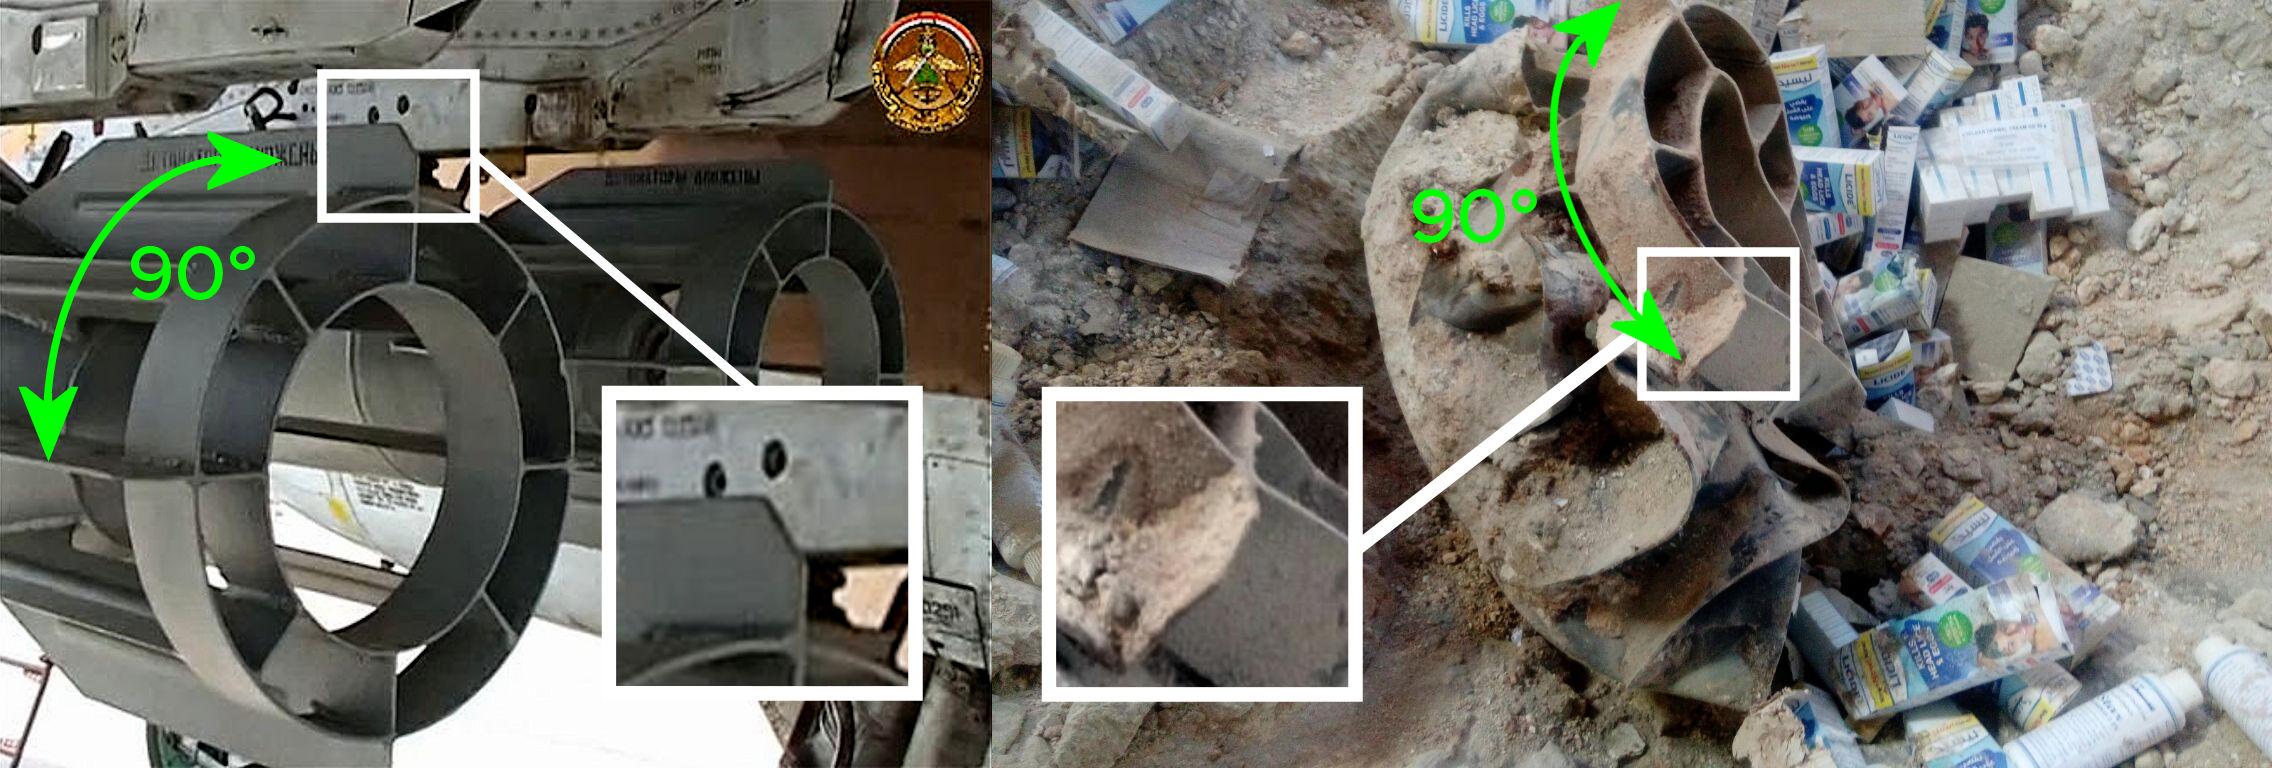 syria-aid-convoy-bomb2-1